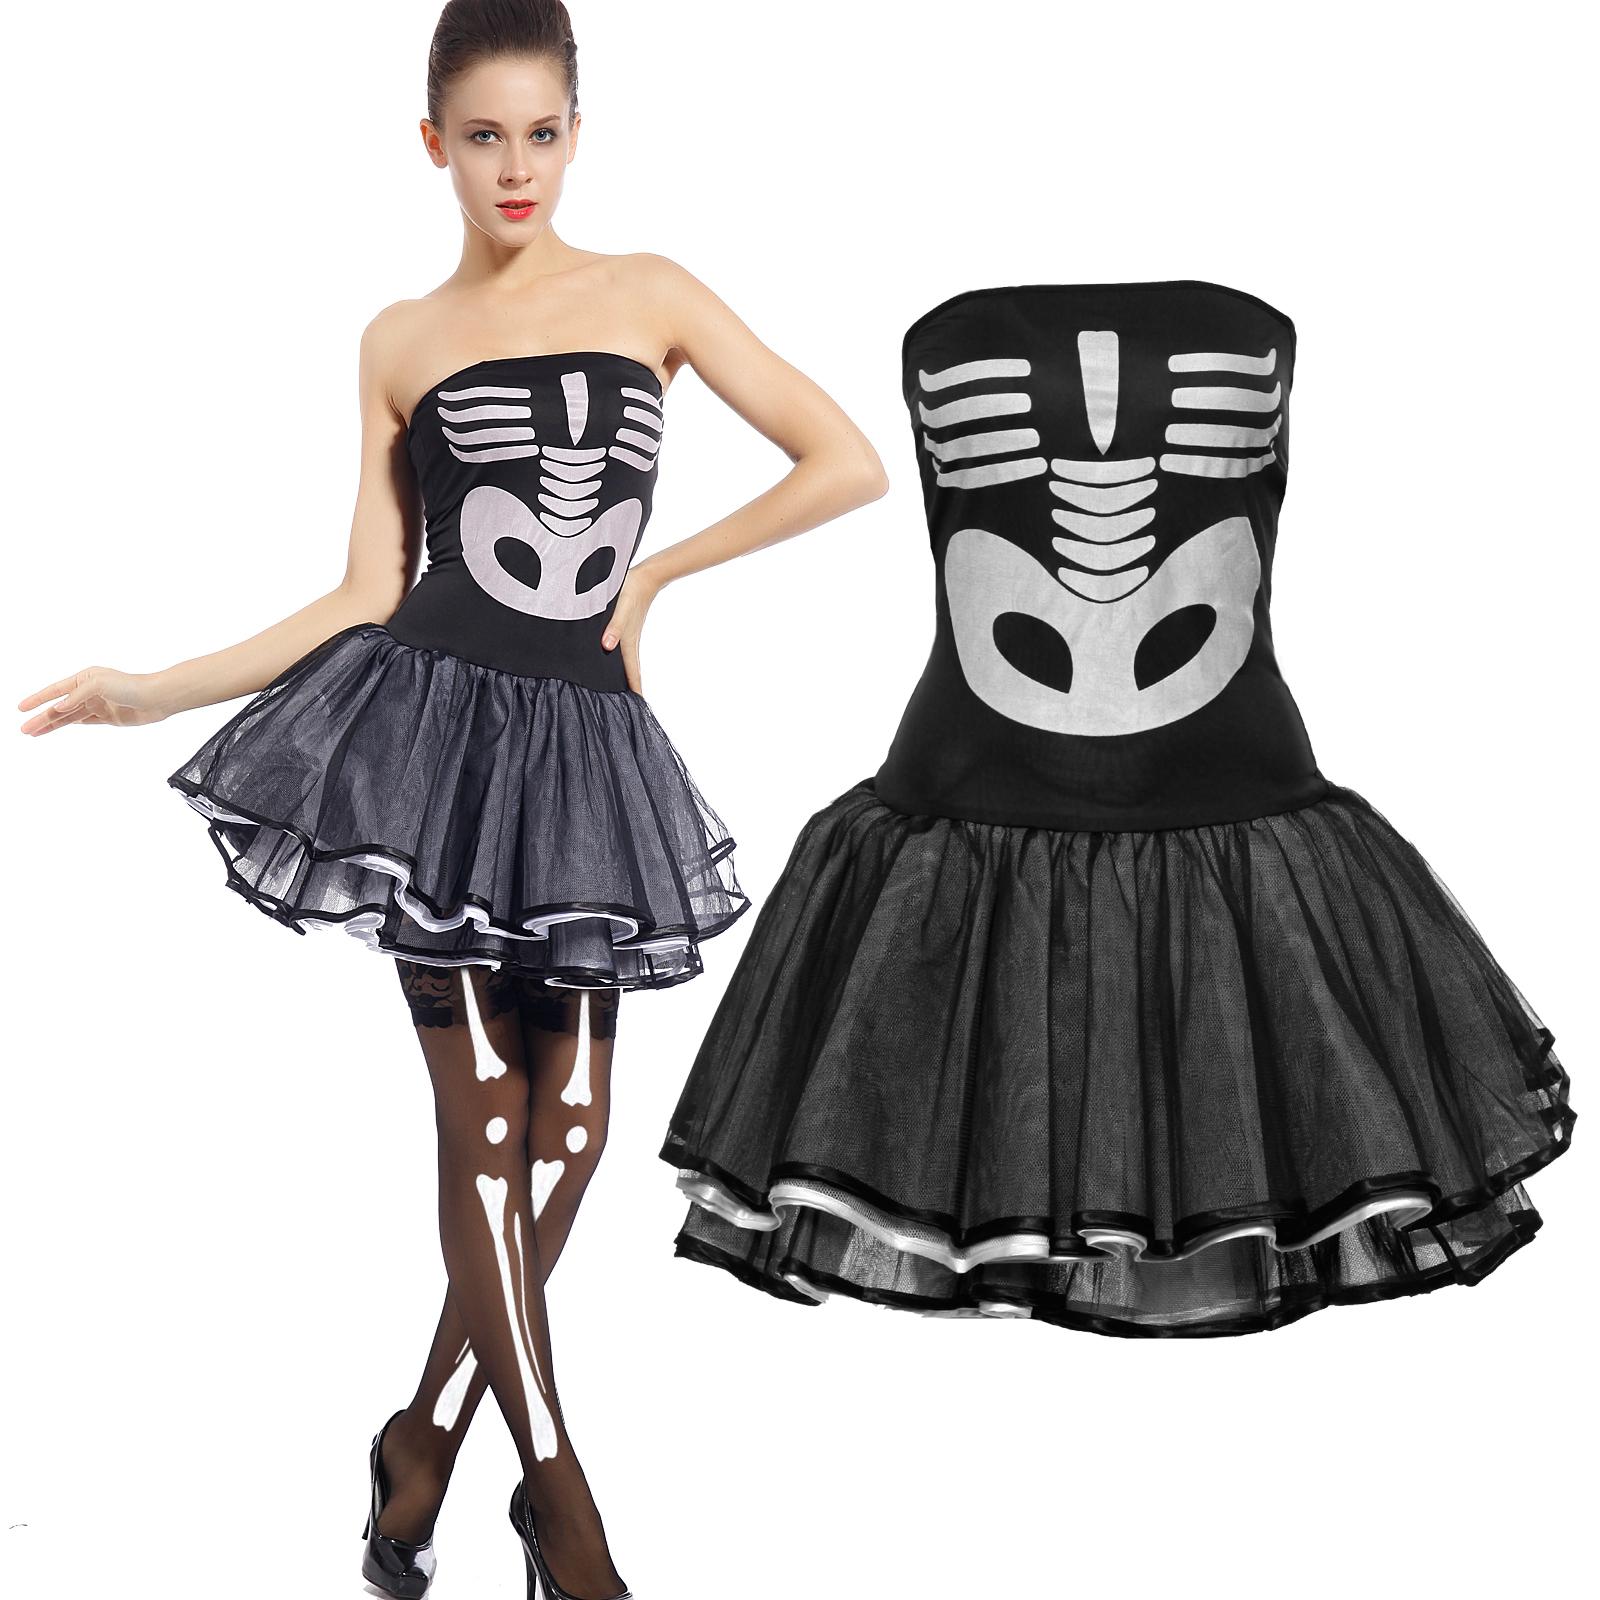 tutu body femmes squelette halloween fantatie costume d guisement tenue ebay. Black Bedroom Furniture Sets. Home Design Ideas